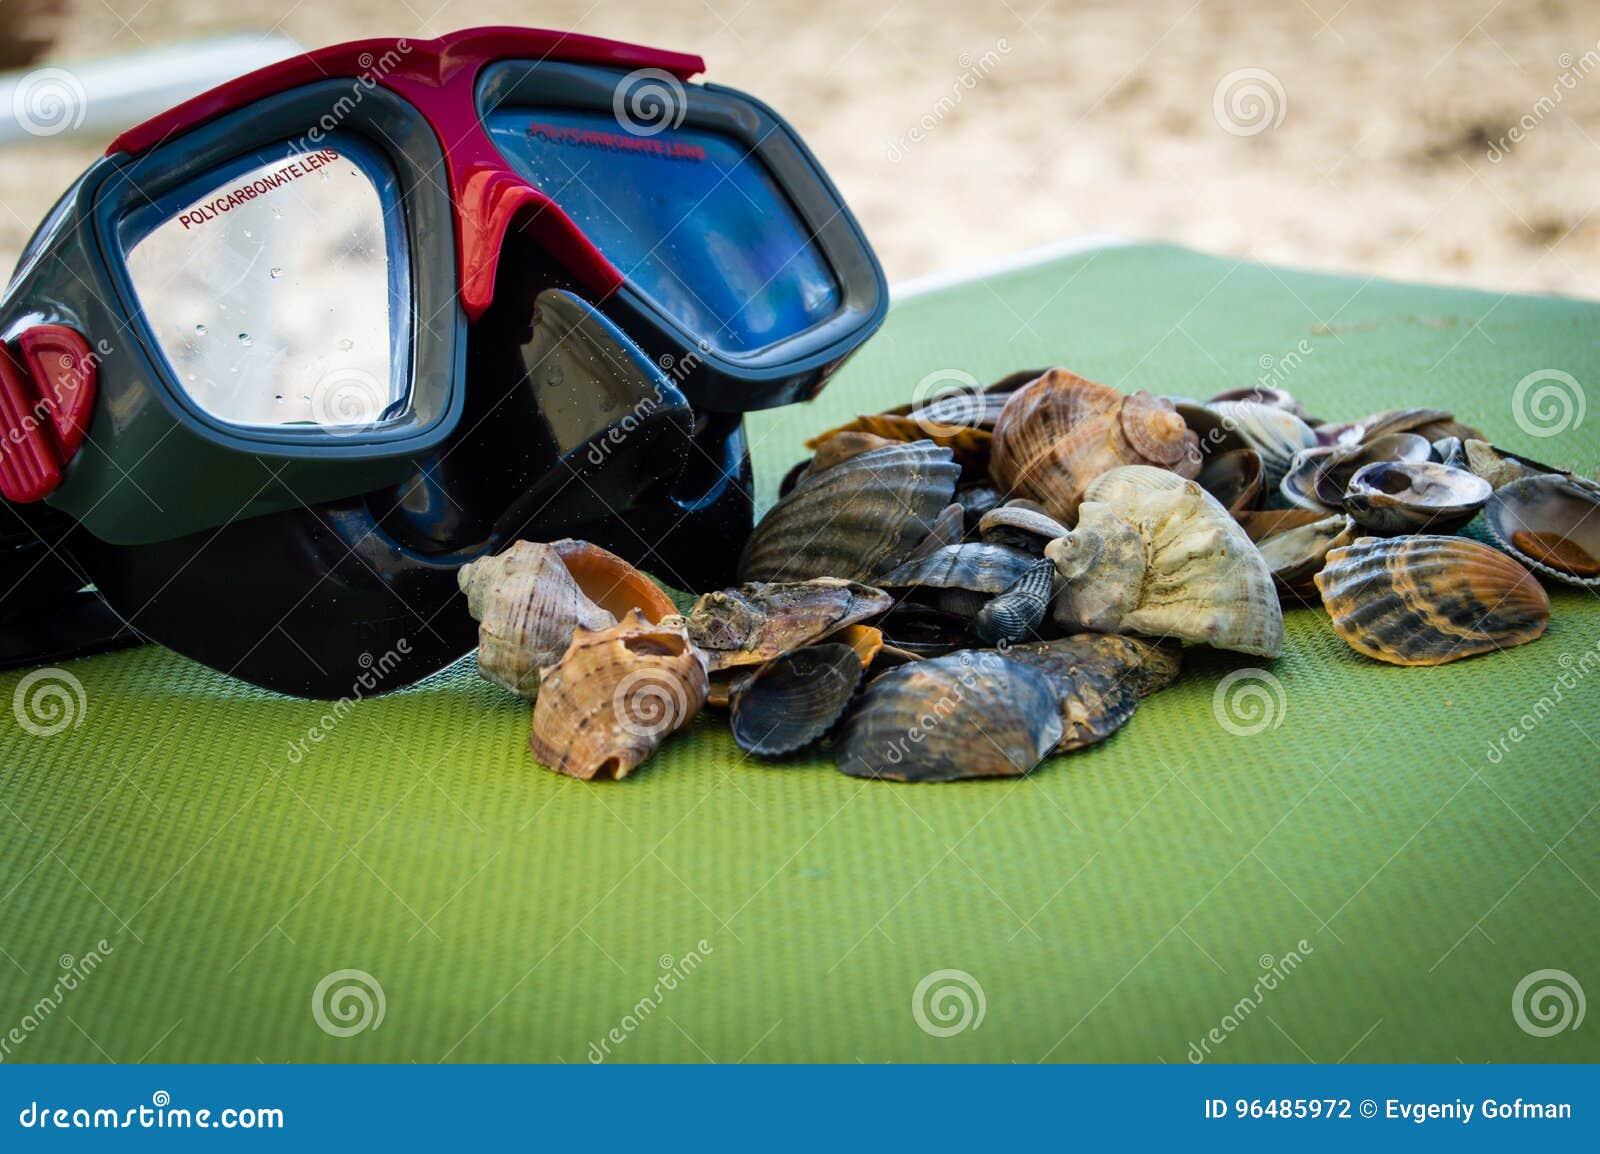 Mask scuba dive with sea shells on the sea coast. blue green background